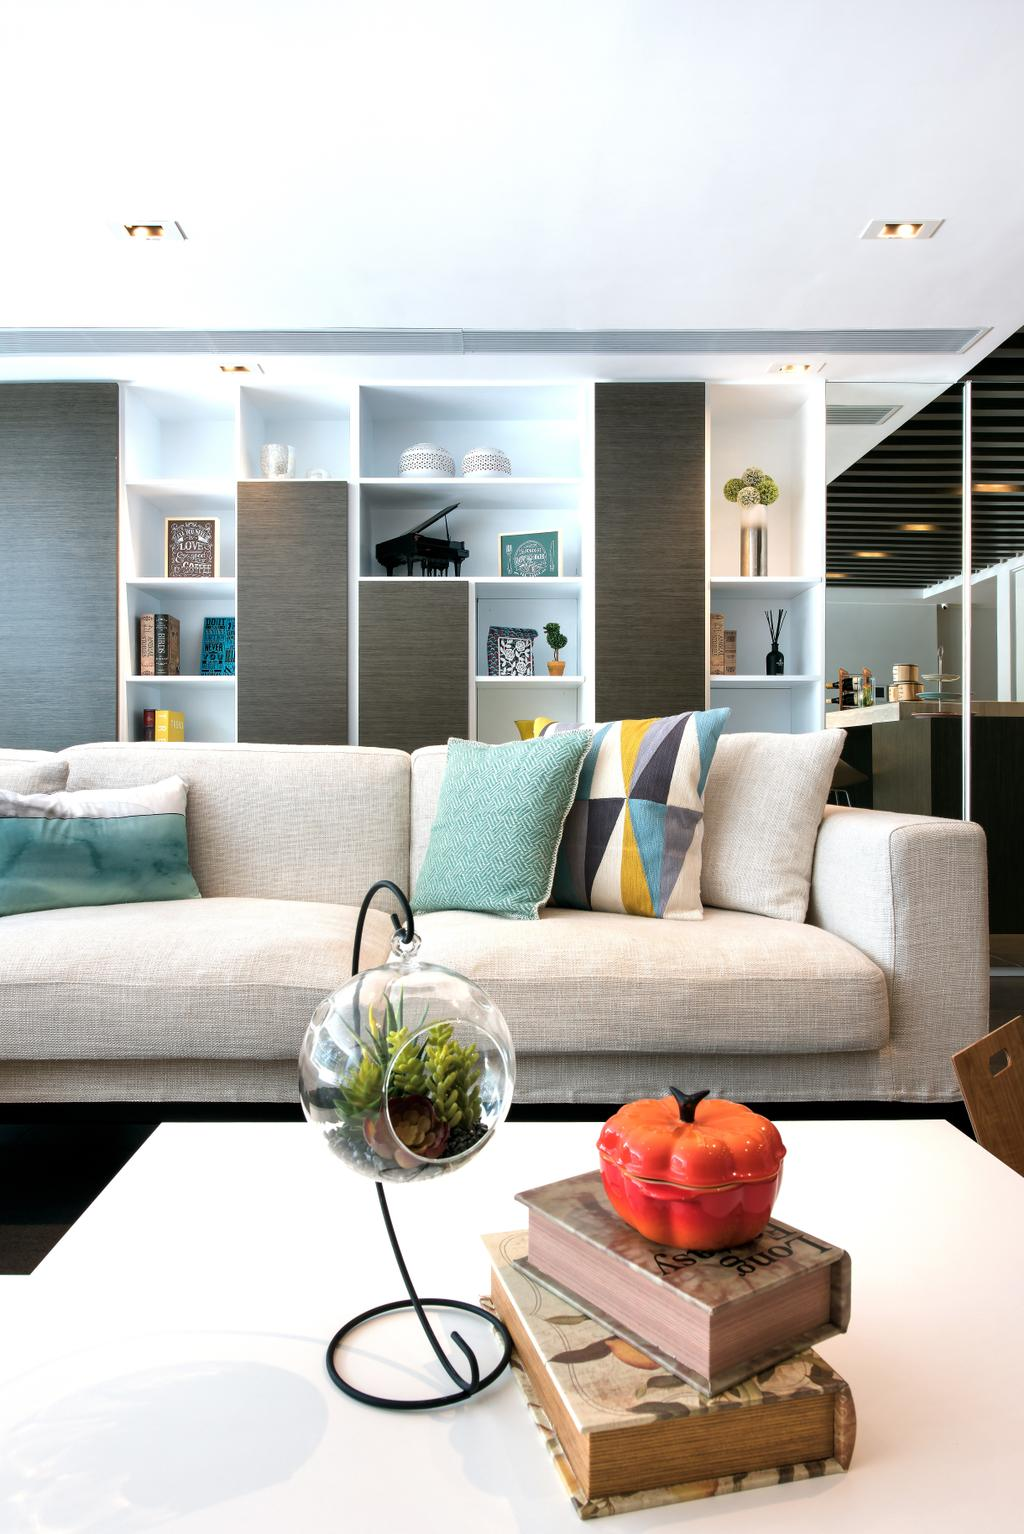 摩登, 獨立屋, 客廳, Casa Marina, 室內設計師, 畫斯室內設計, Couch, Furniture, Chair, Cushion, Home Decor, Jar